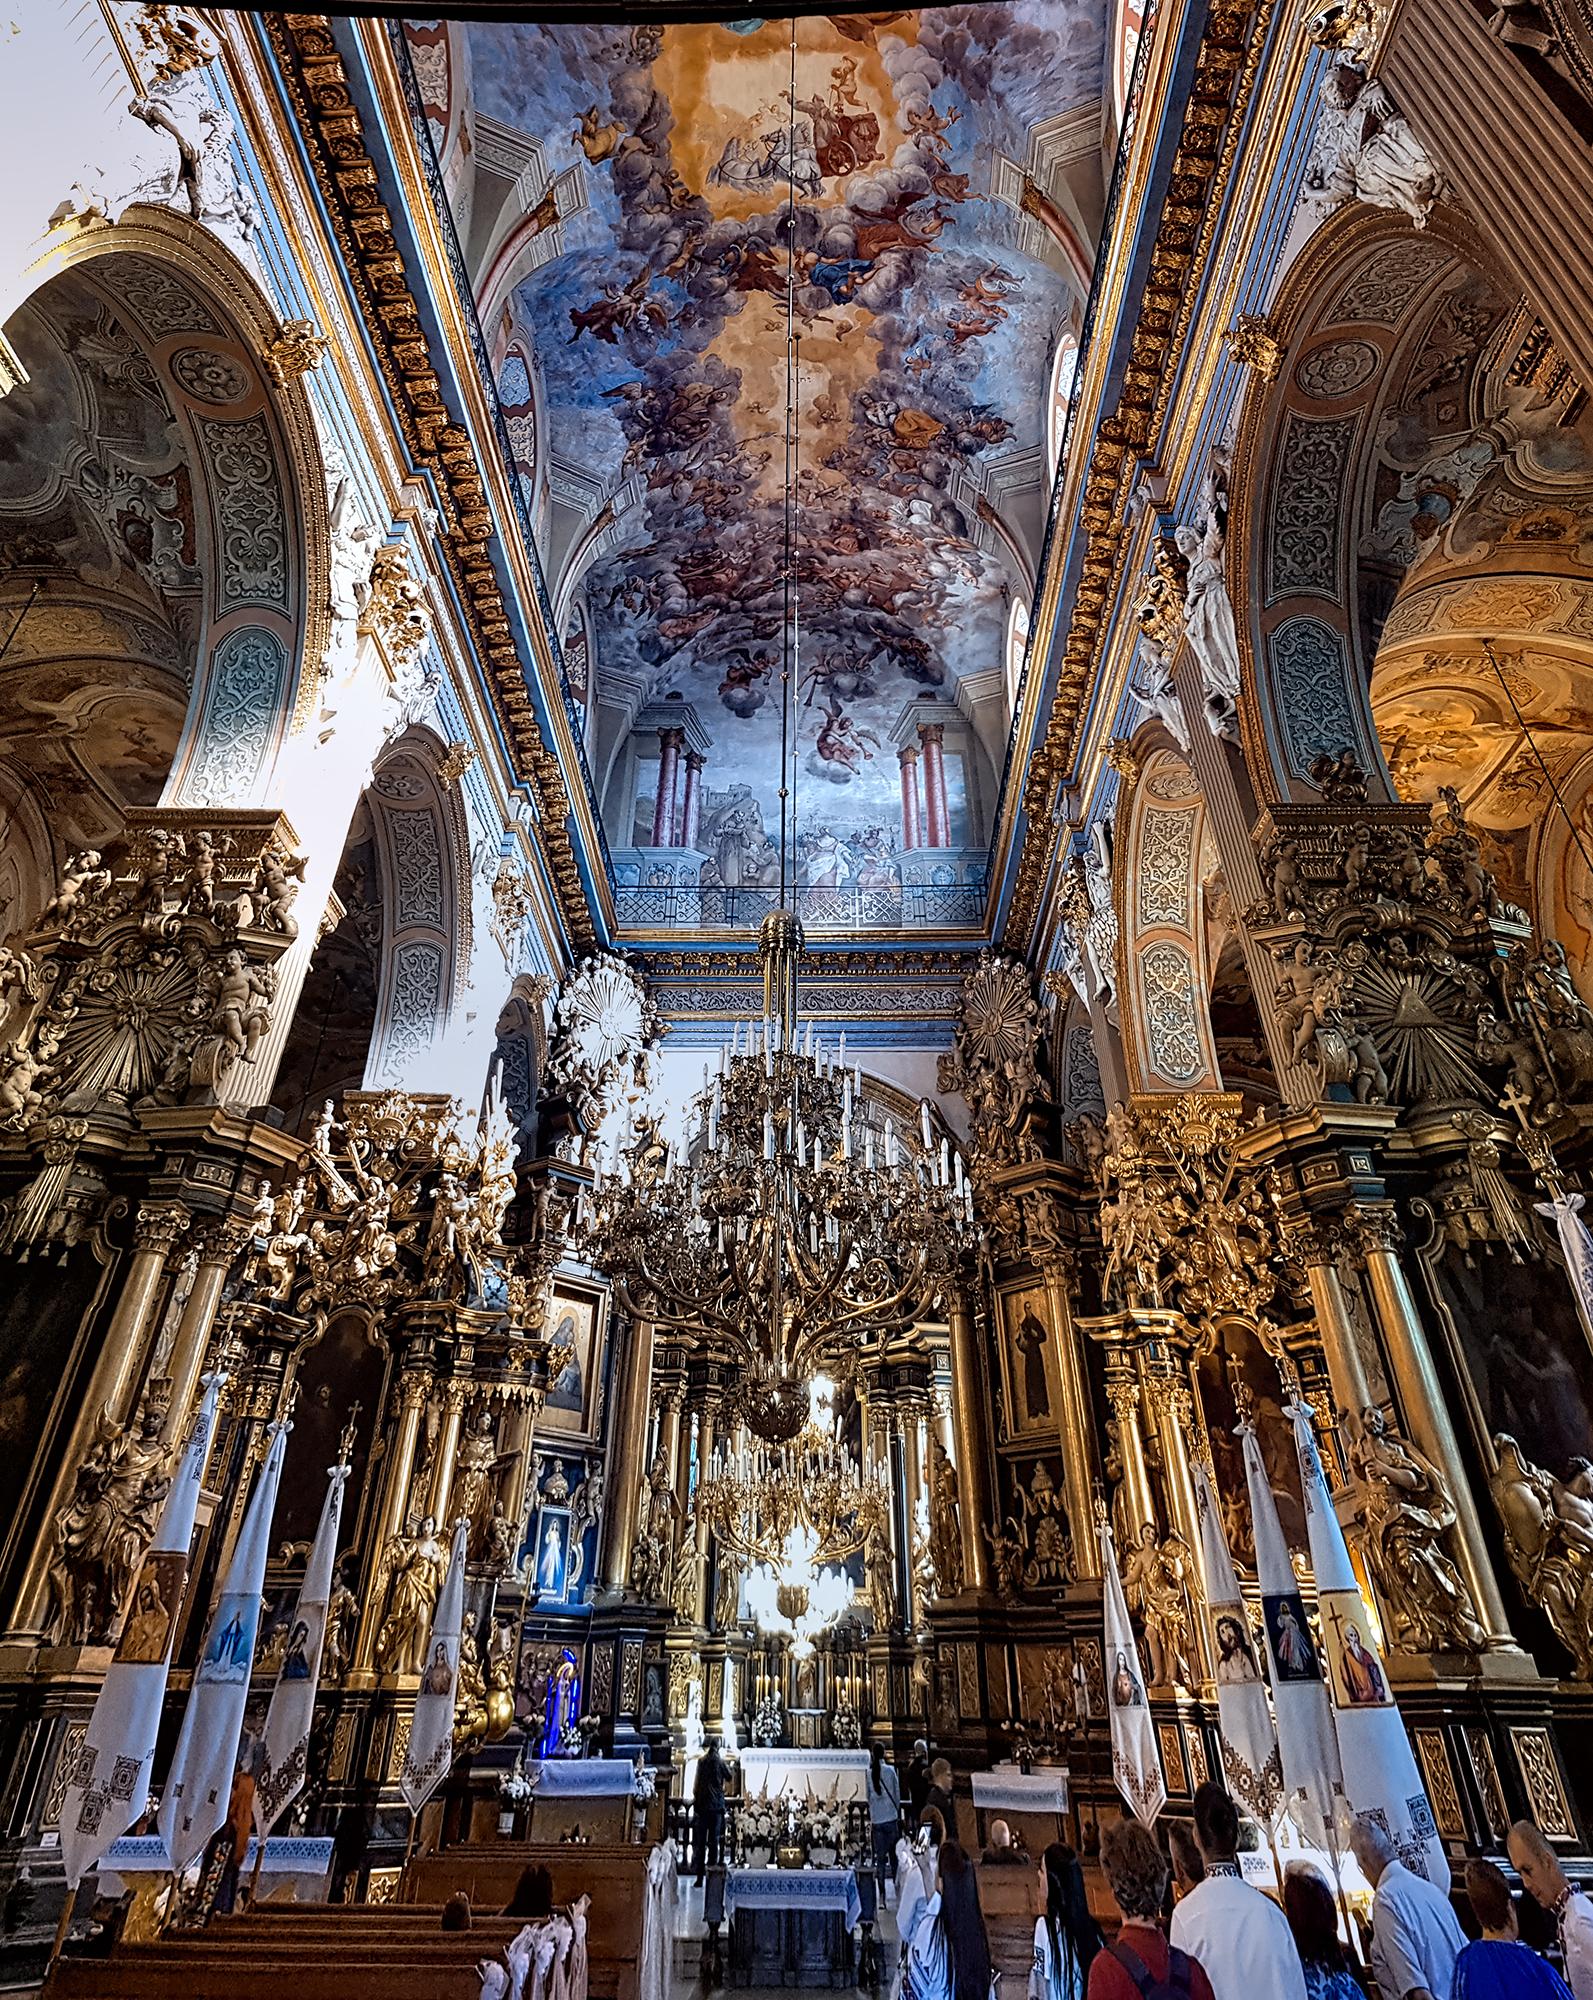 lviv-churchofstandrew-interior-pano-2019-09-22-©adrianstorey